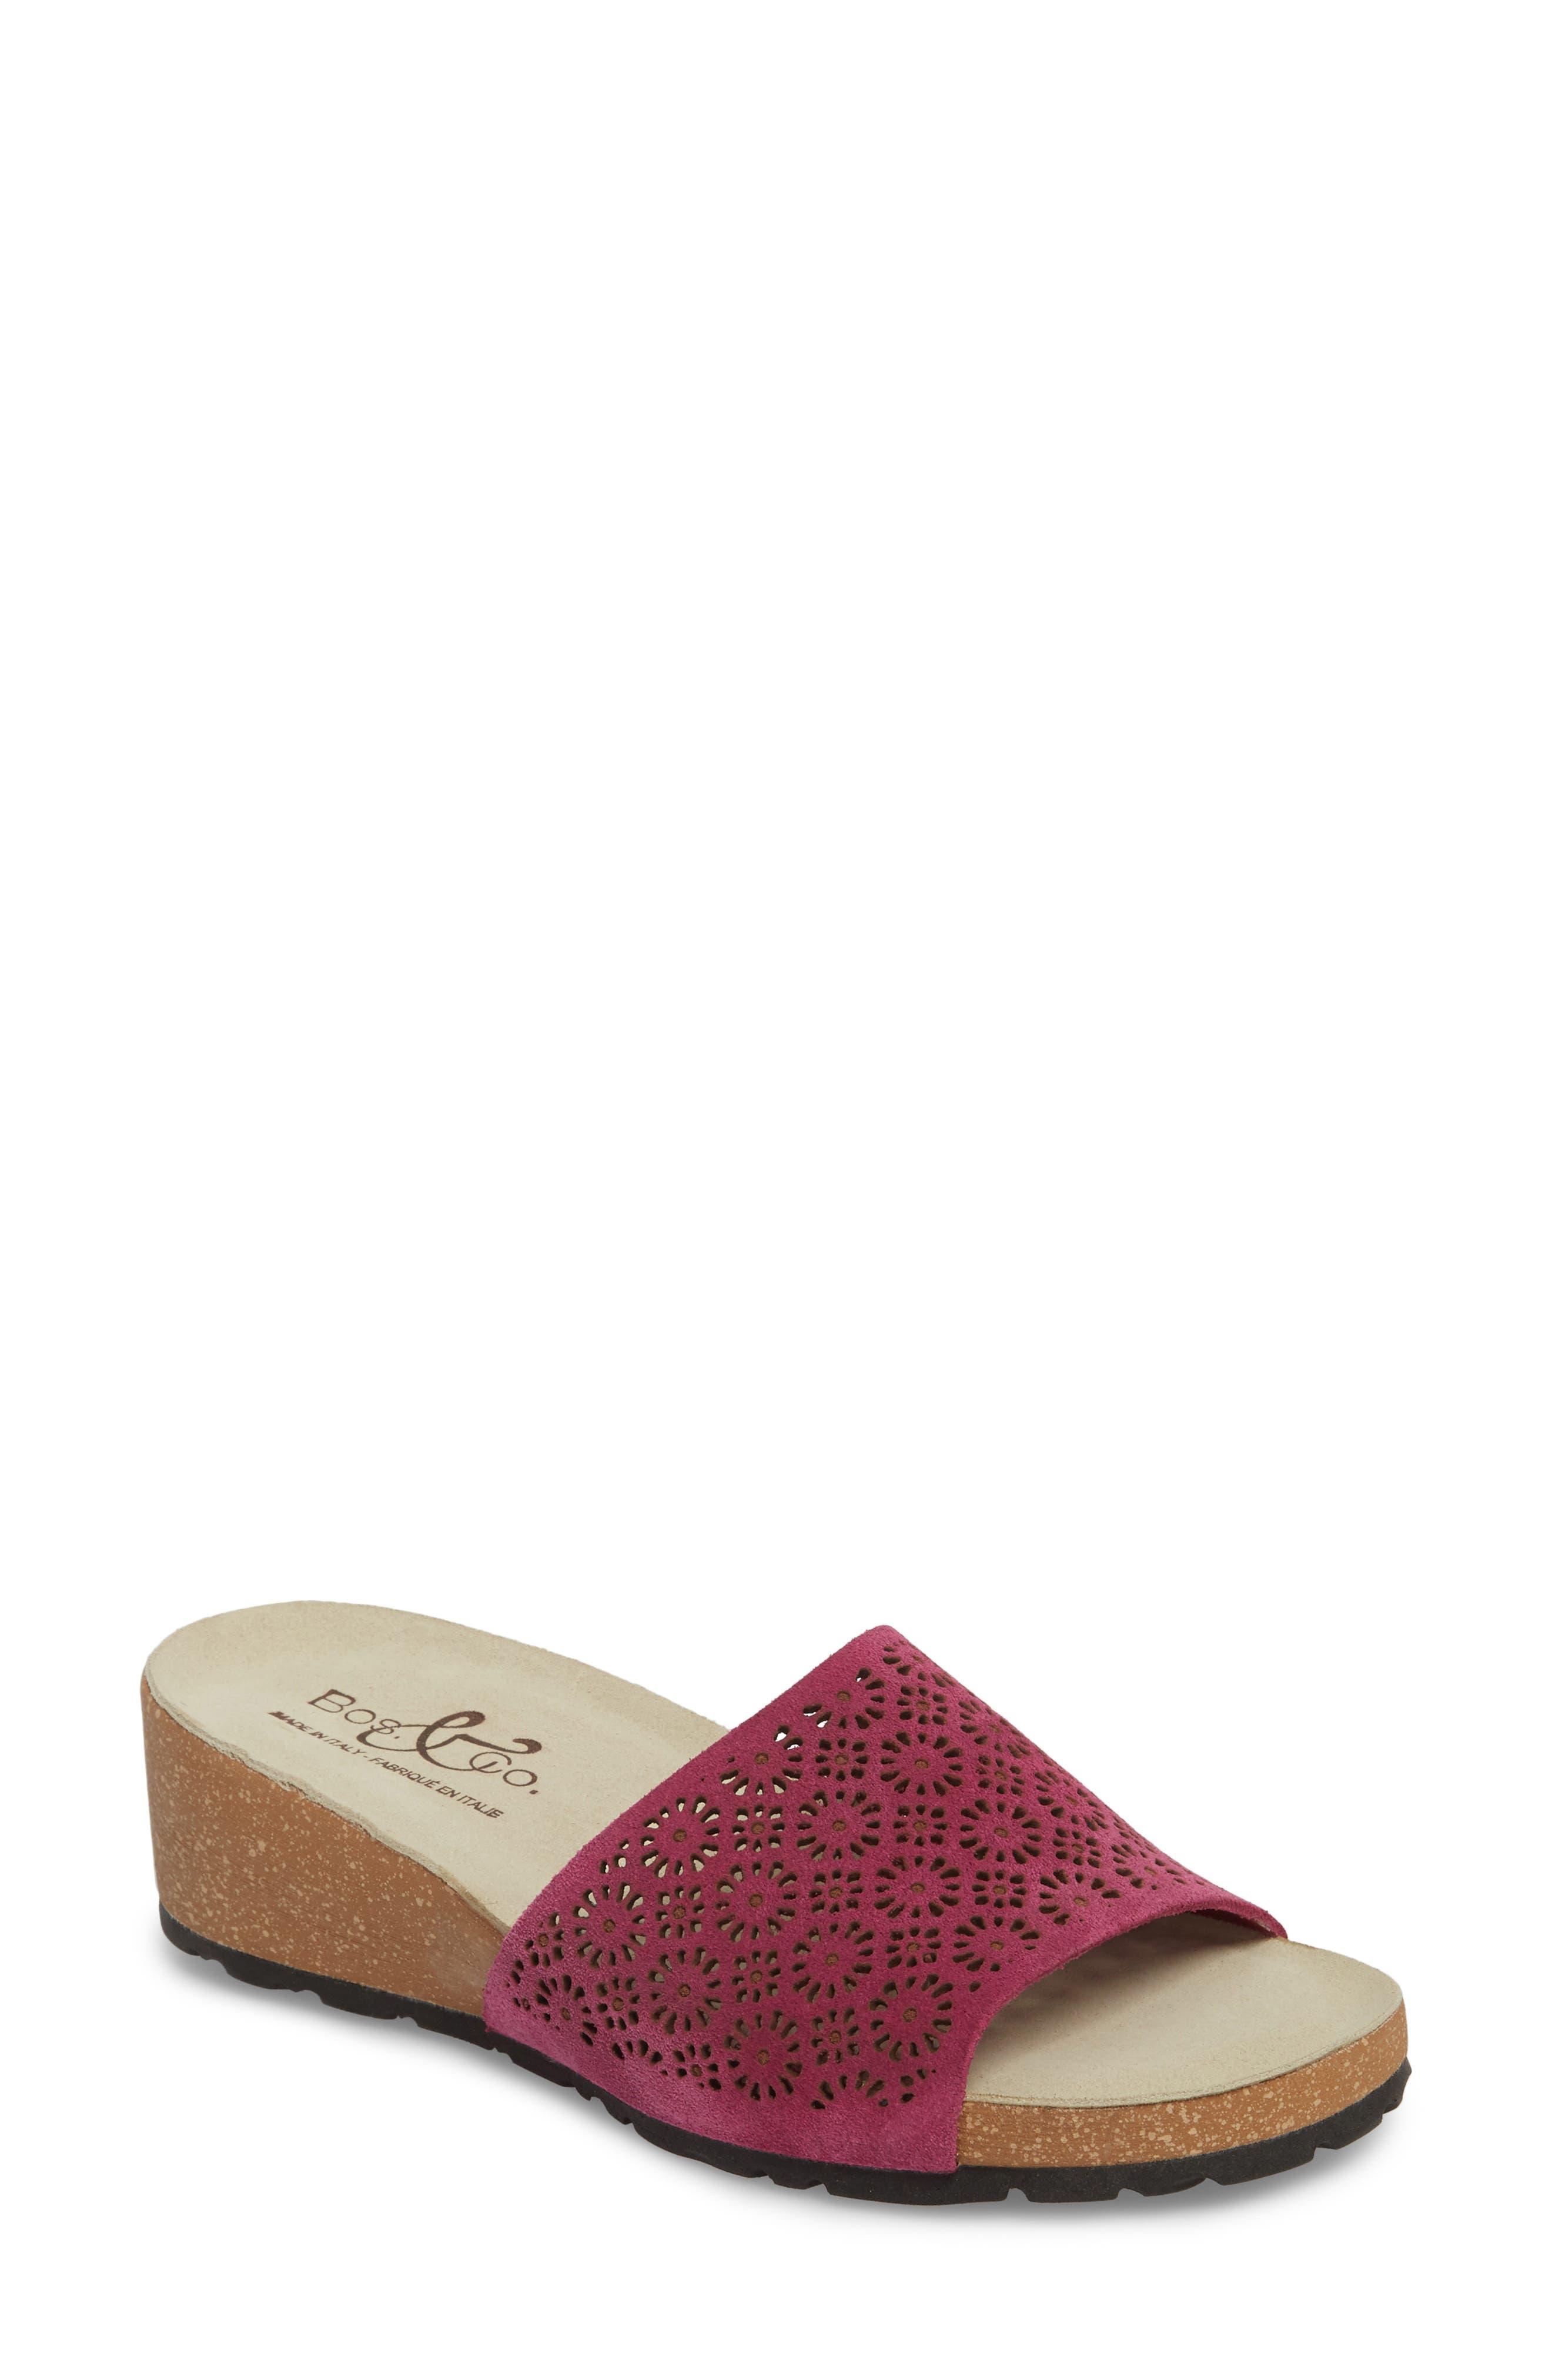 Loa Wedge Slide Sandal,                         Main,                         color, Fuchsia Suede